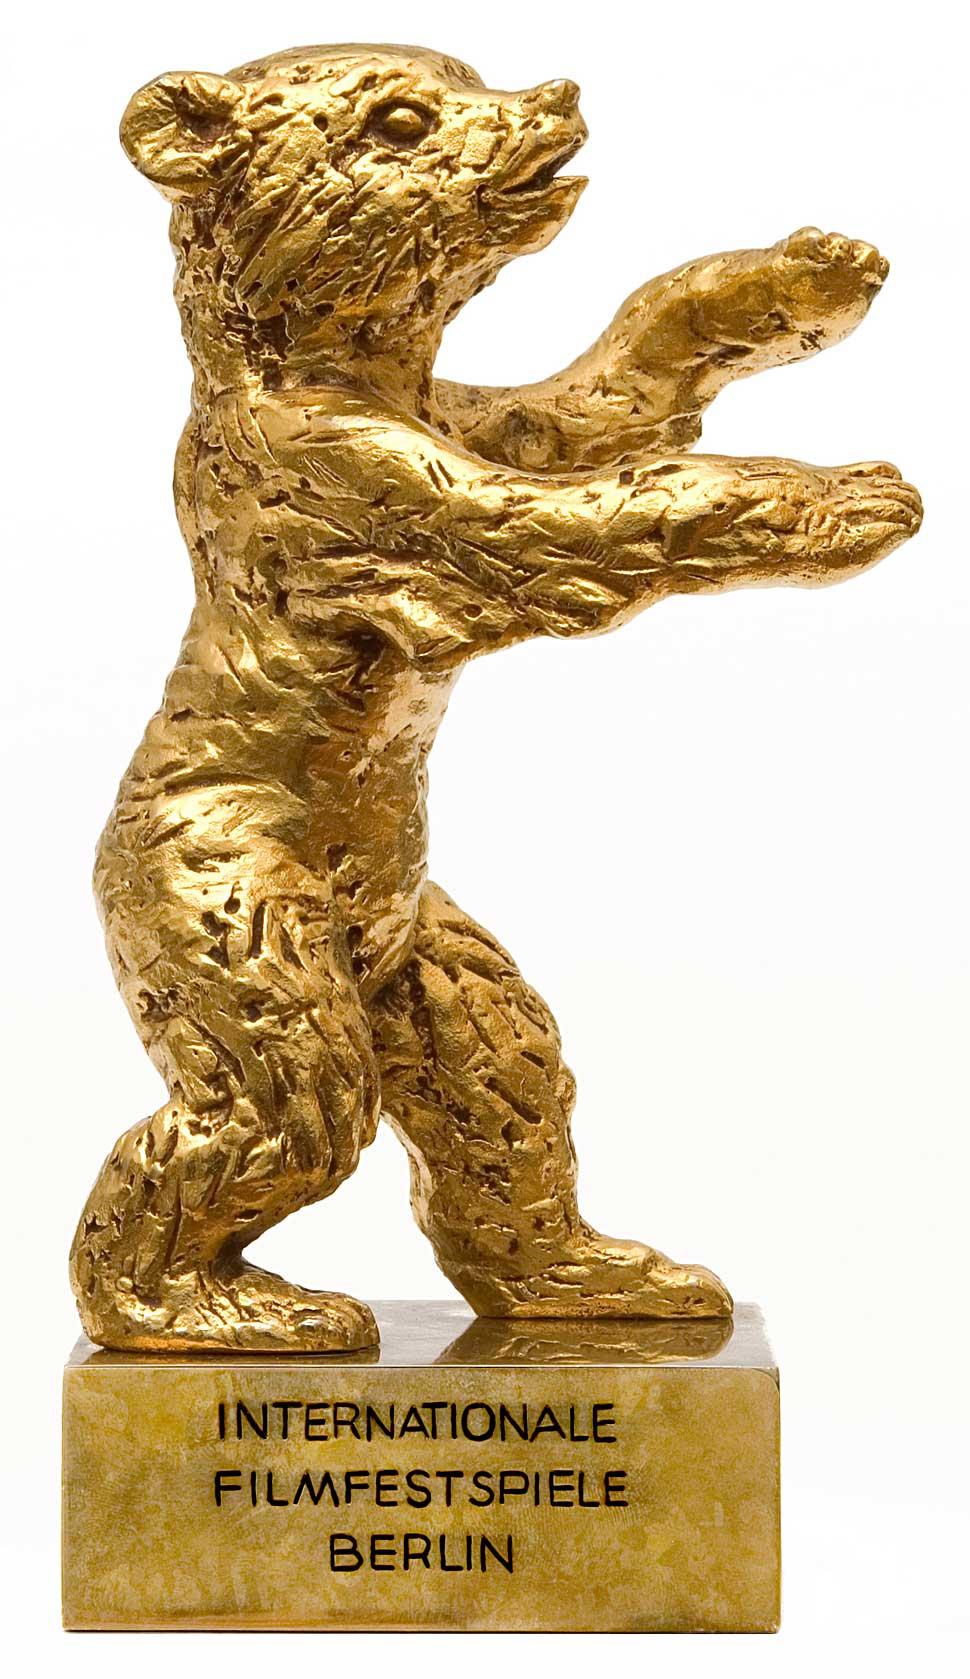 B_0212_Berlinale_Gold_C_G